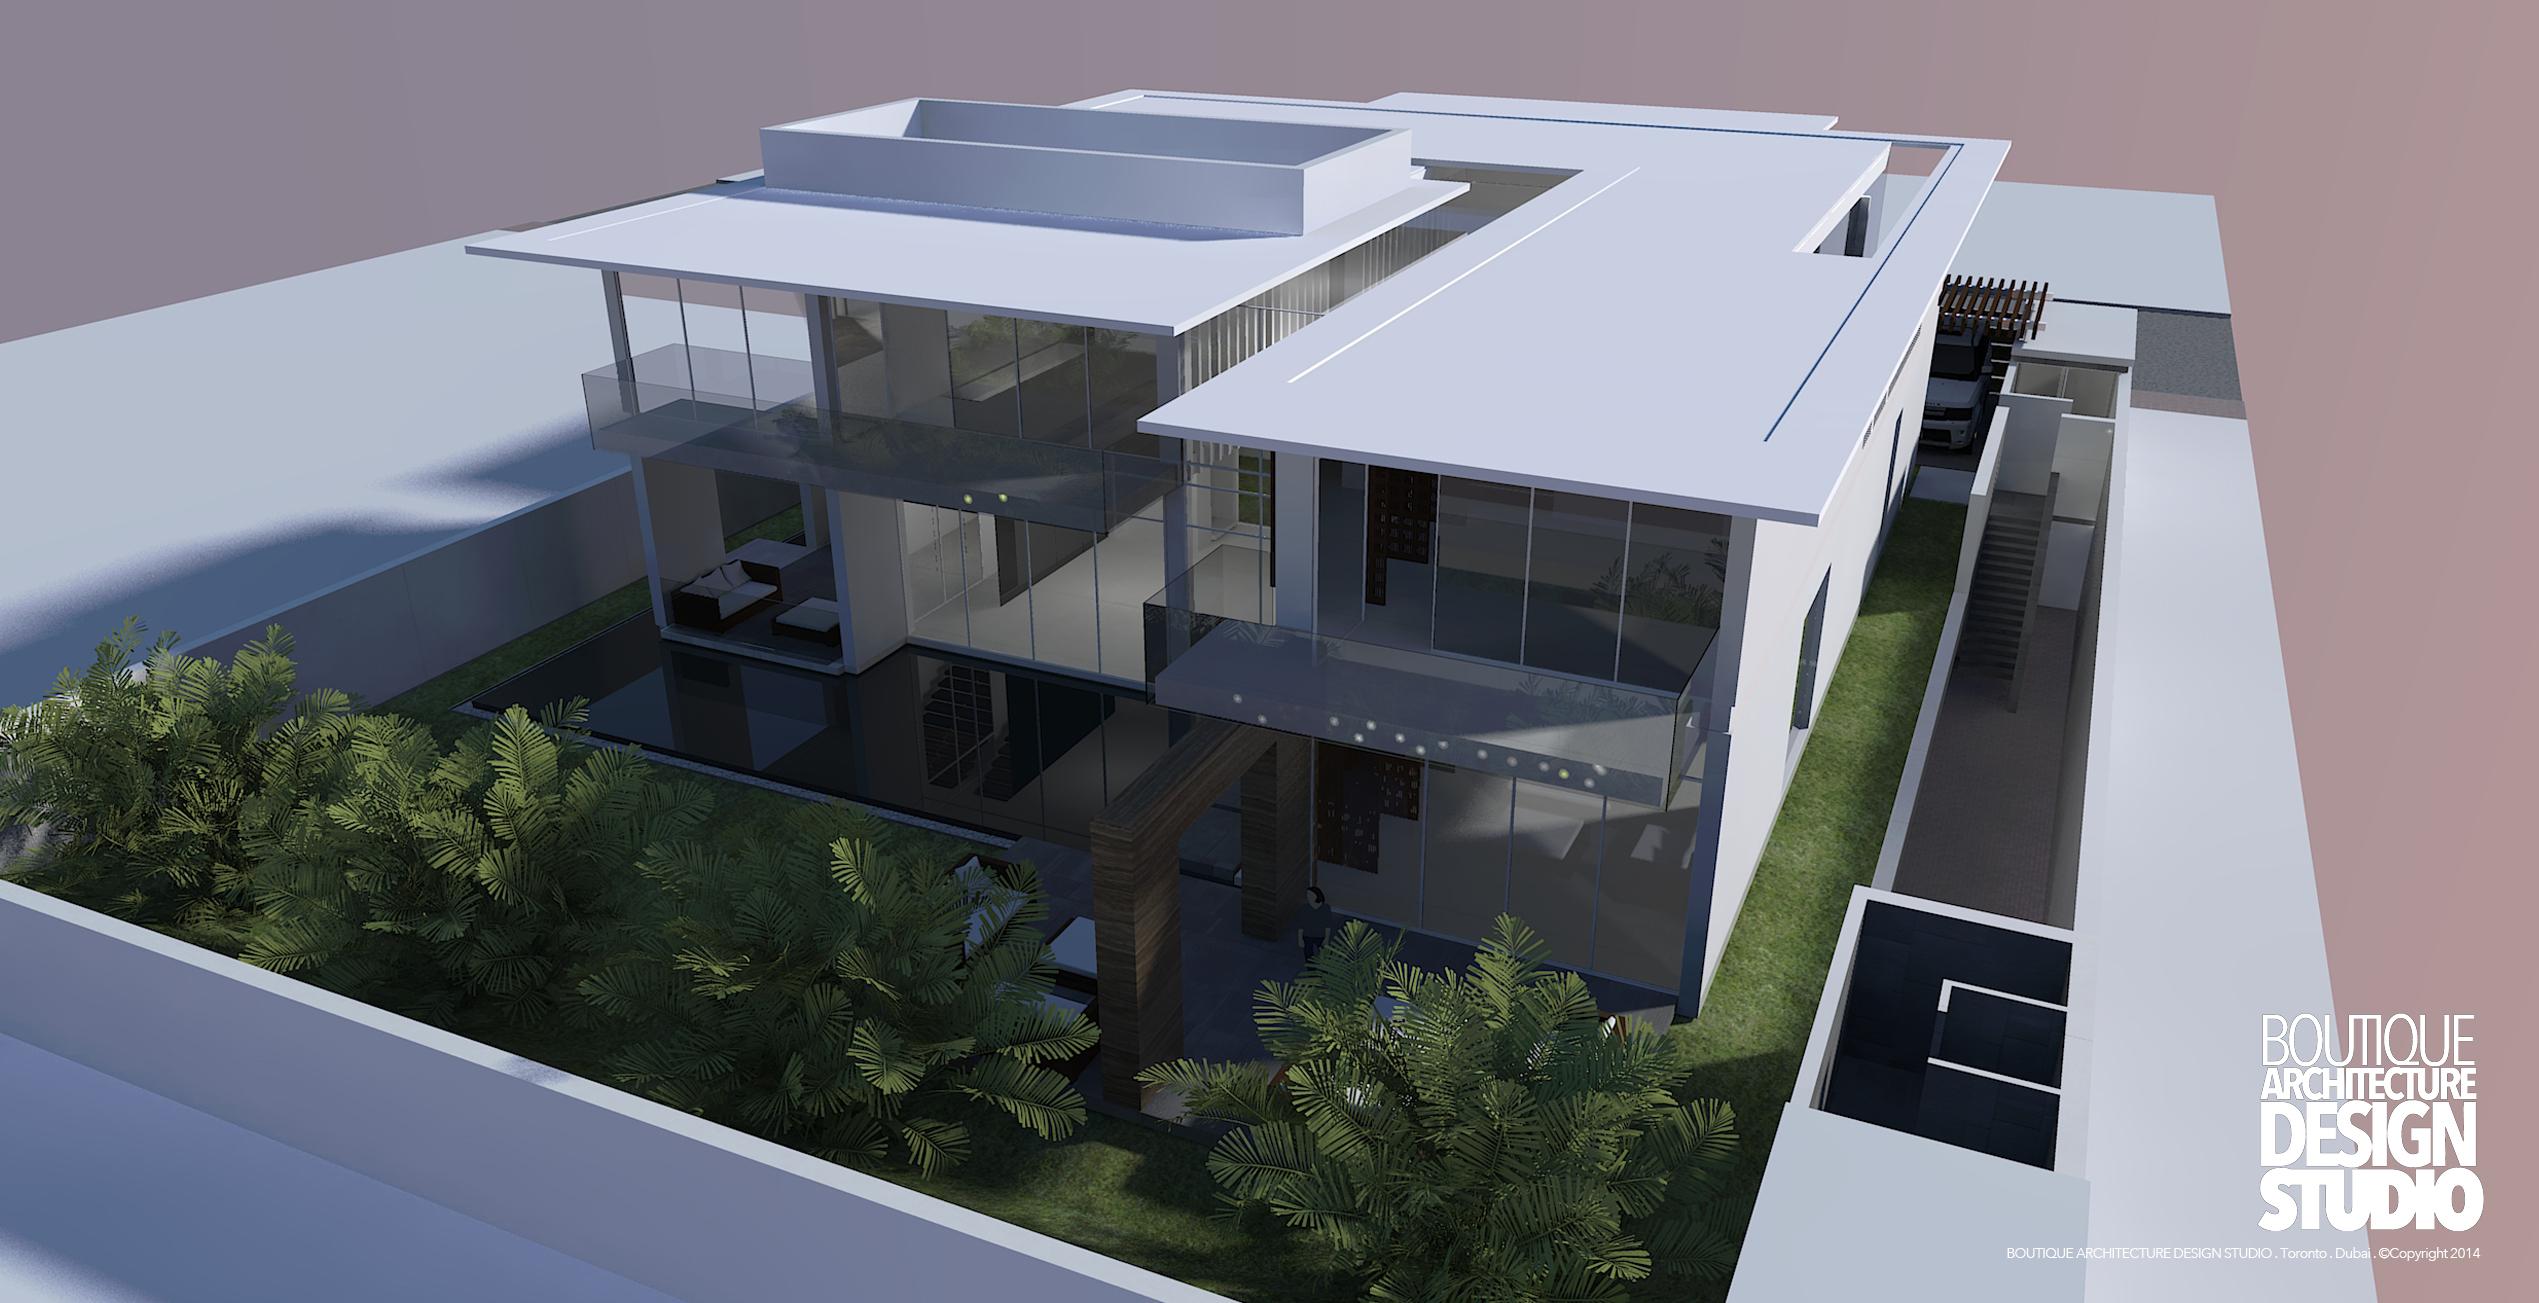 Boutique Architecture Design Studio